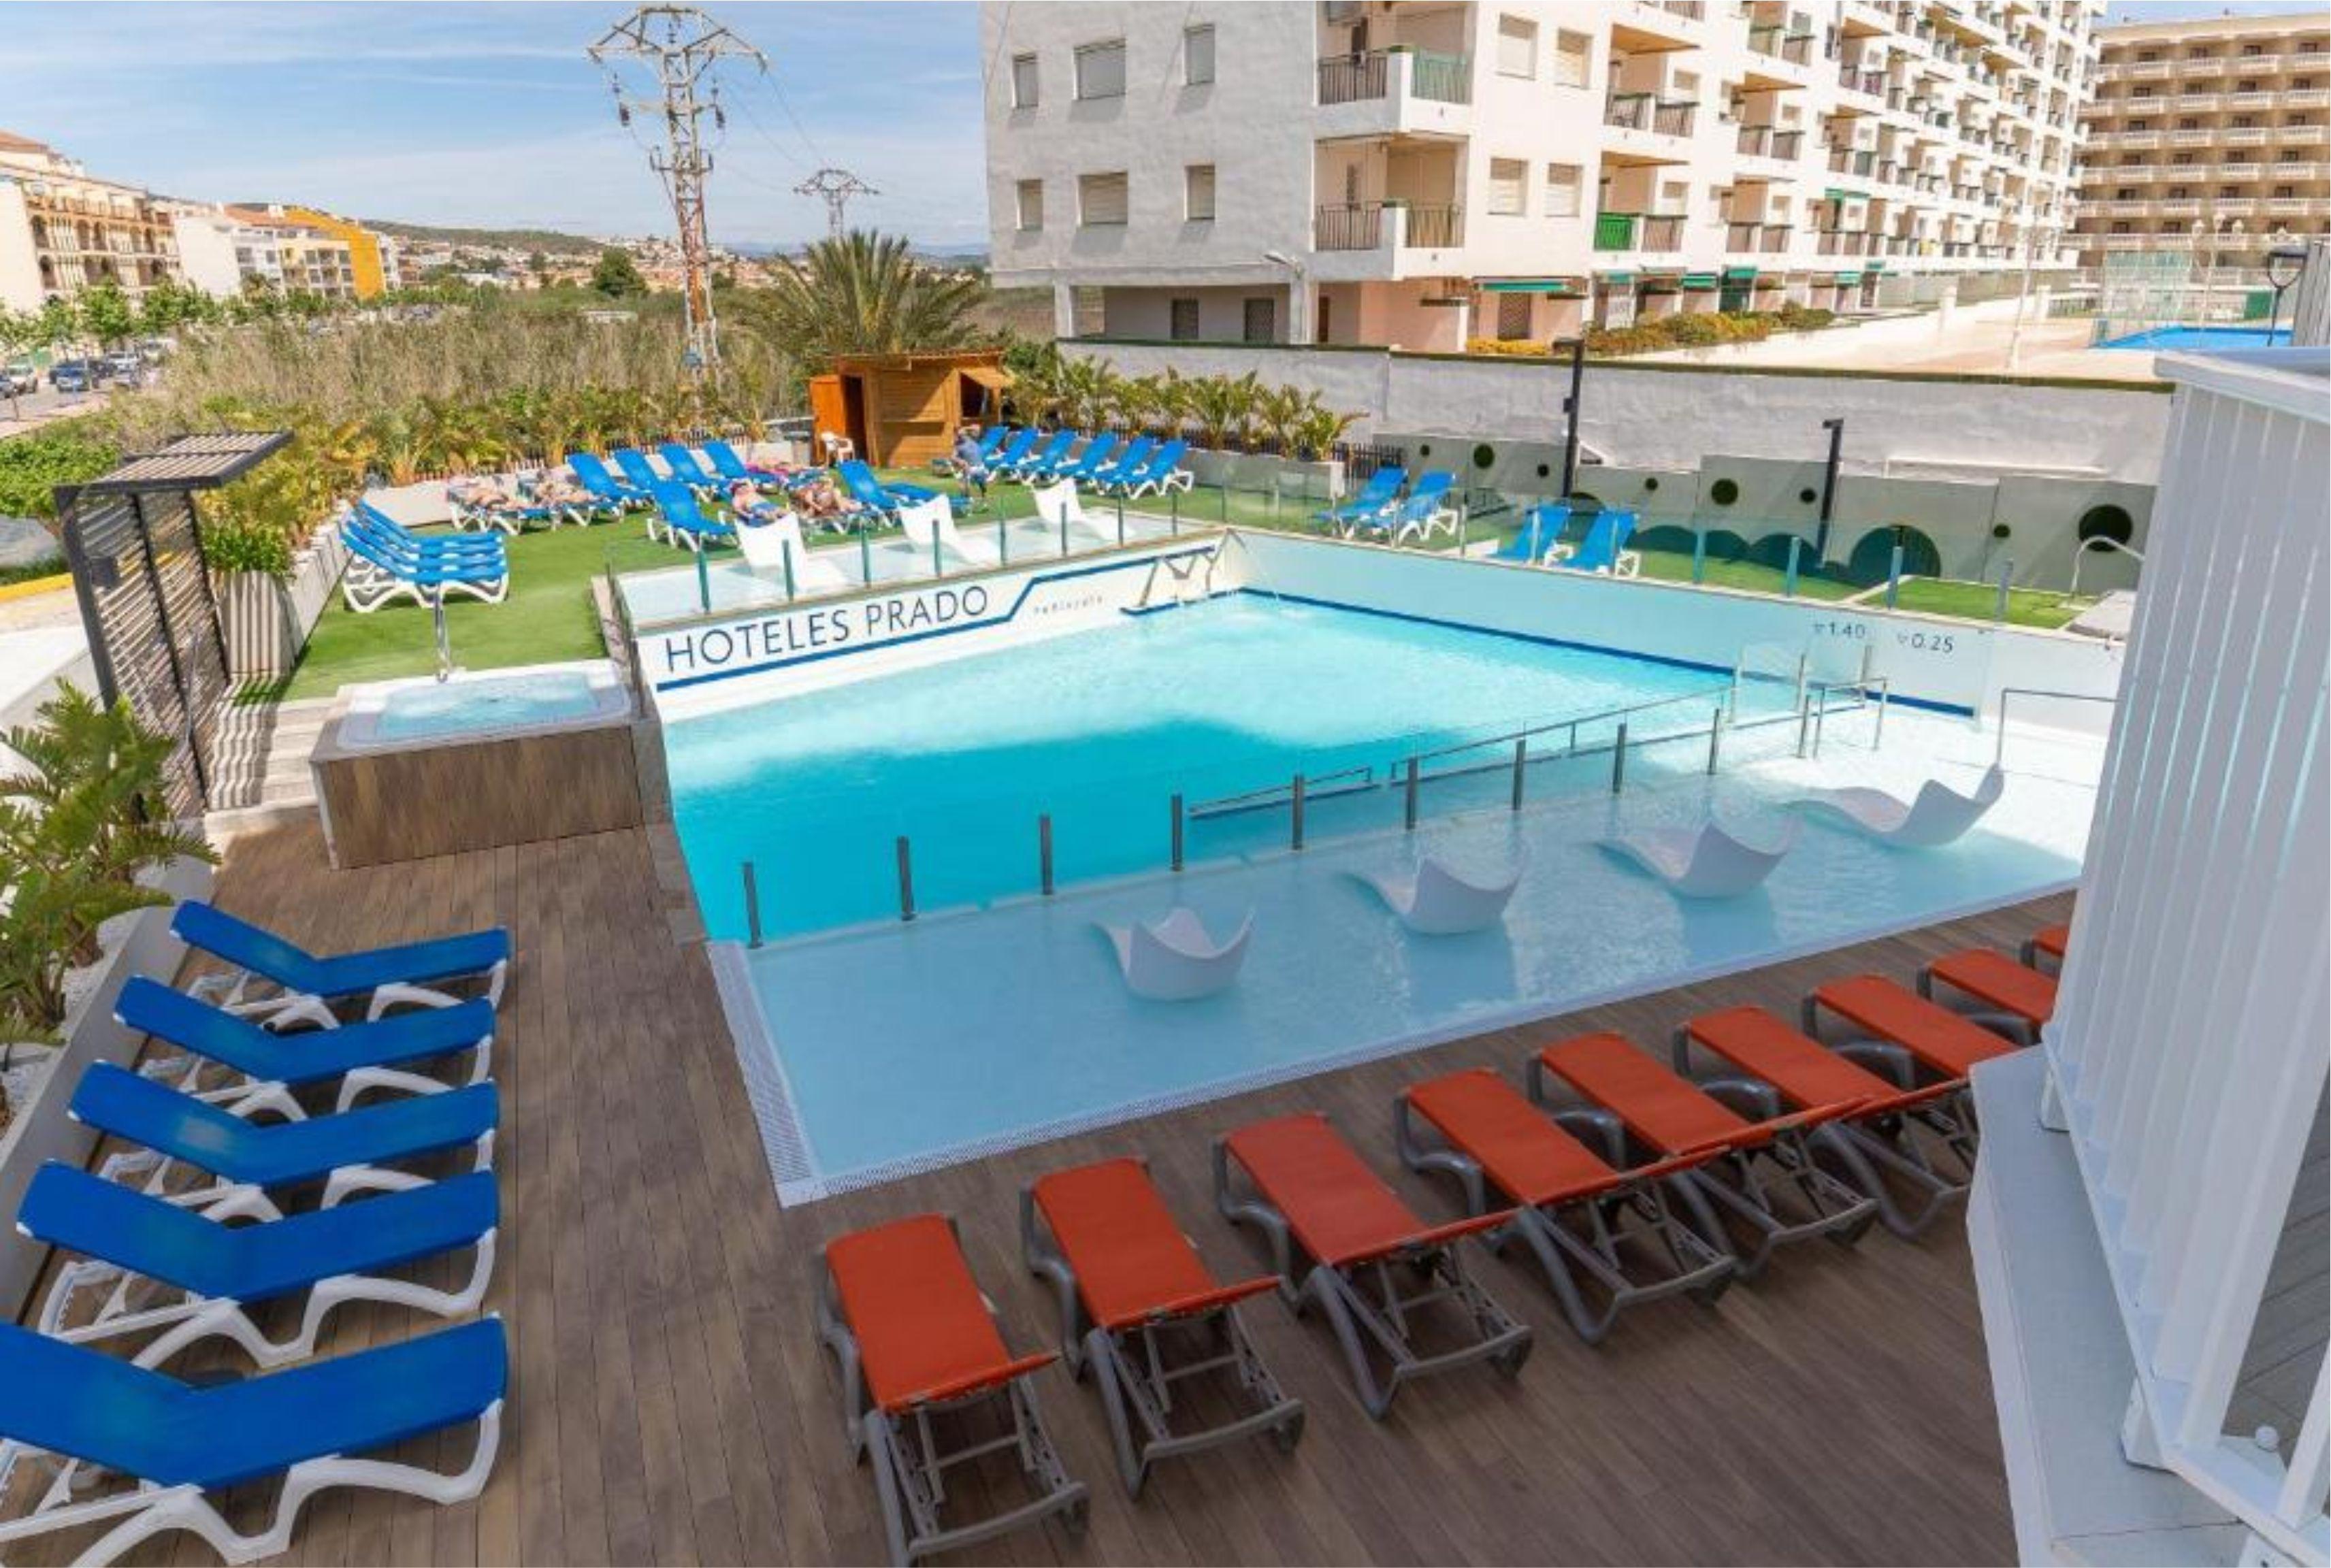 HOTEL PRADO II 4*